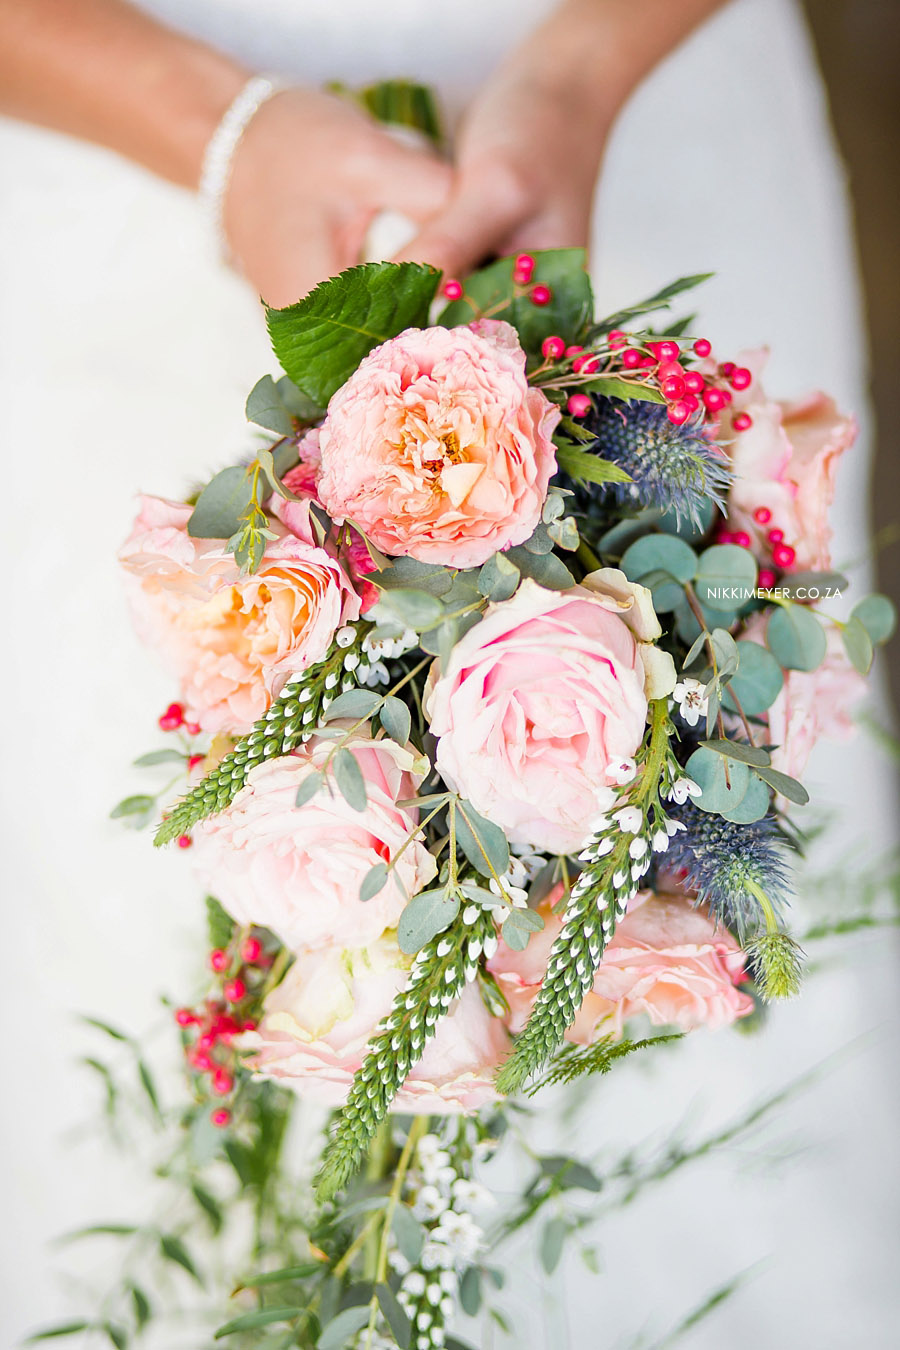 nikki_meyer_wedding_photographer_Cape_Town_016